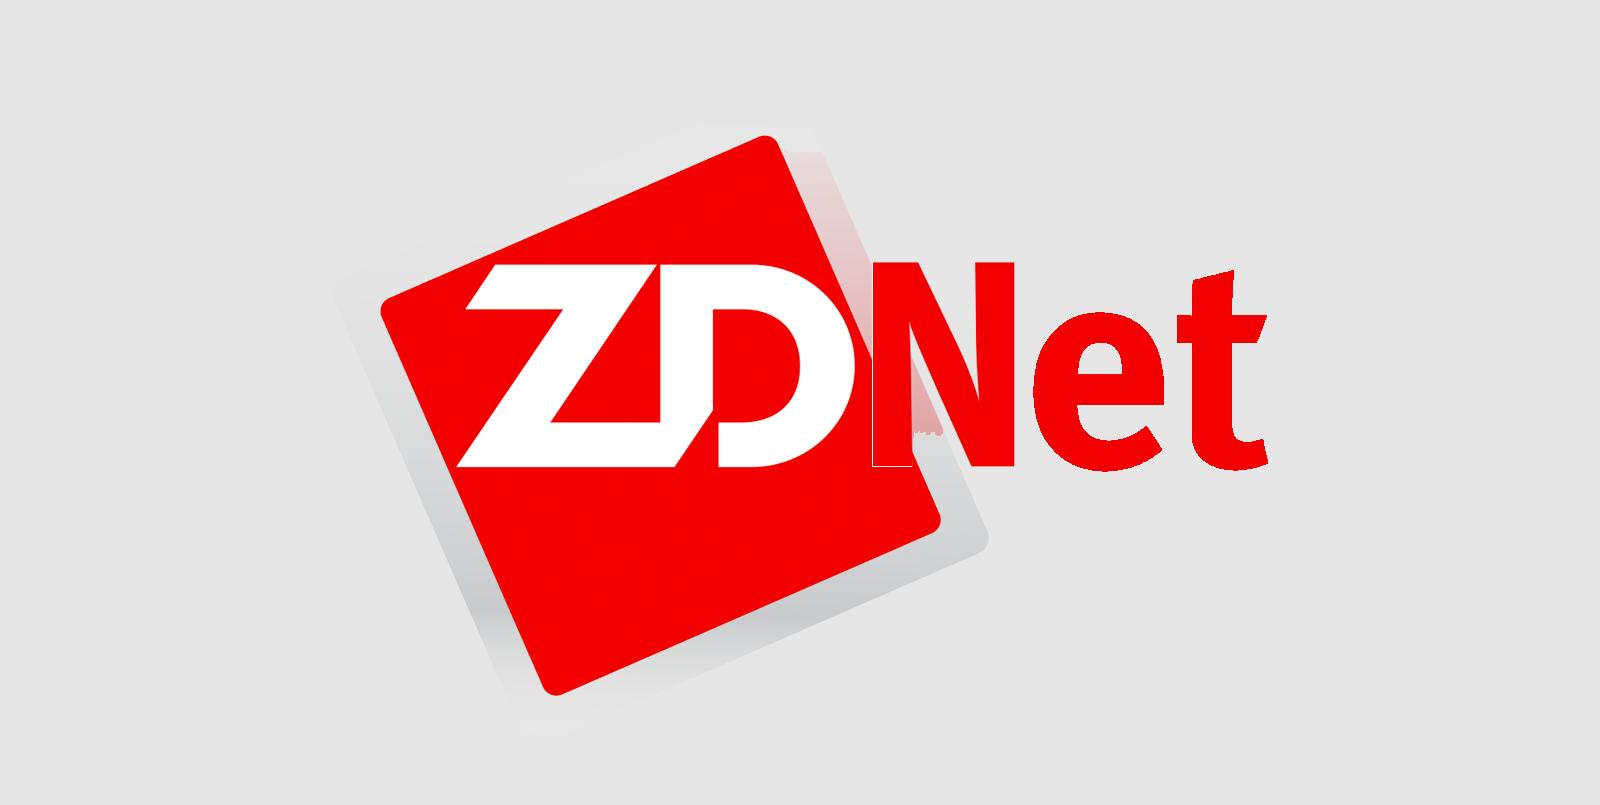 Cloudify CEO on ZDNET